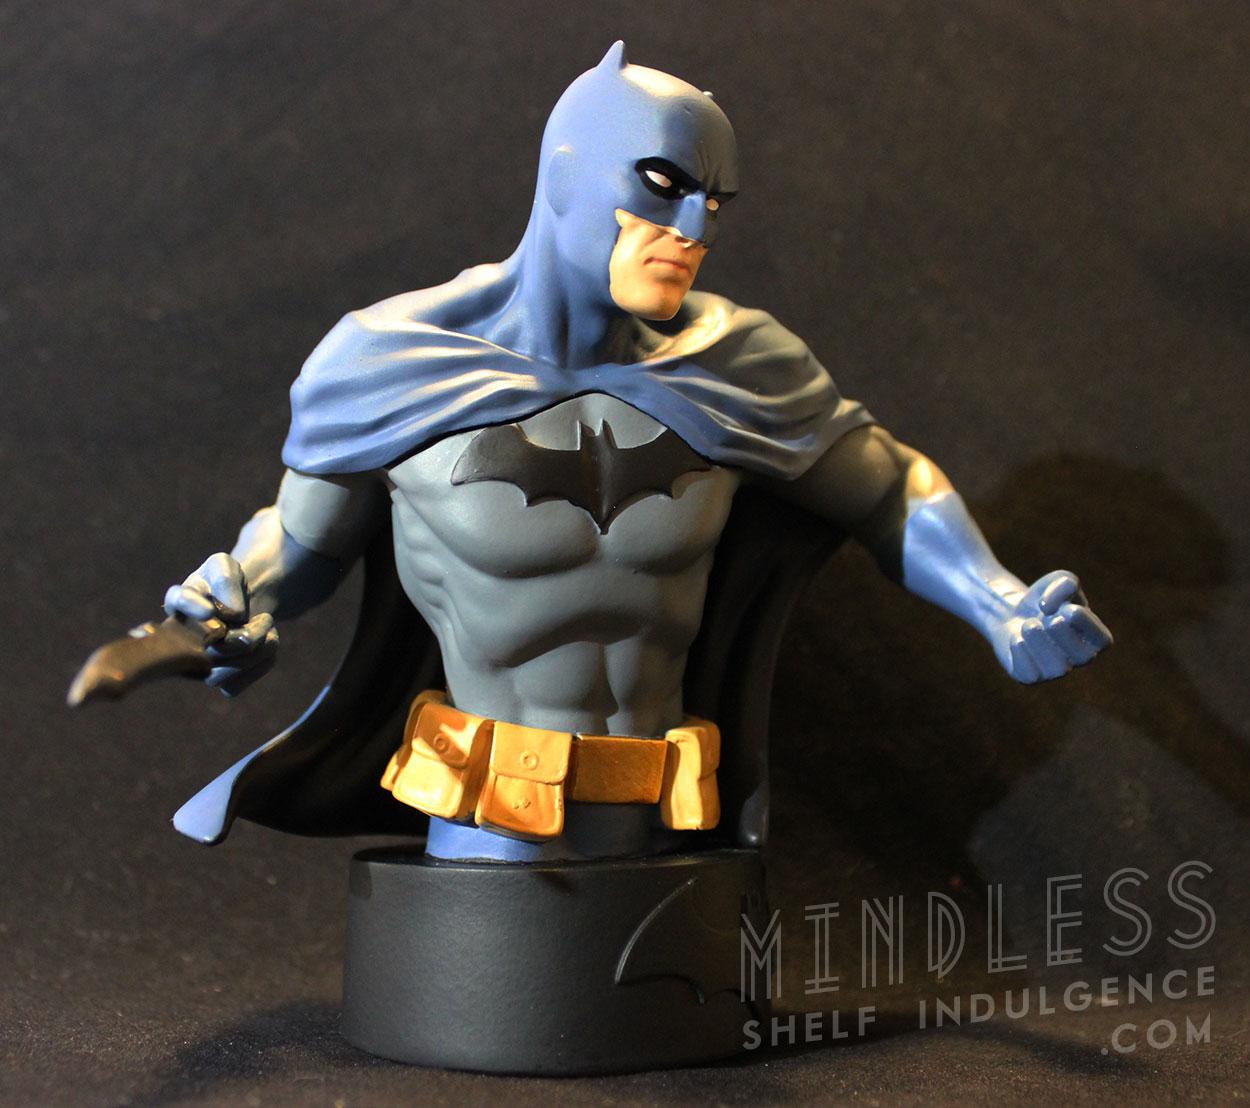 Batman V Eaglemoss Batmangled Mindless Shelf Indulgence